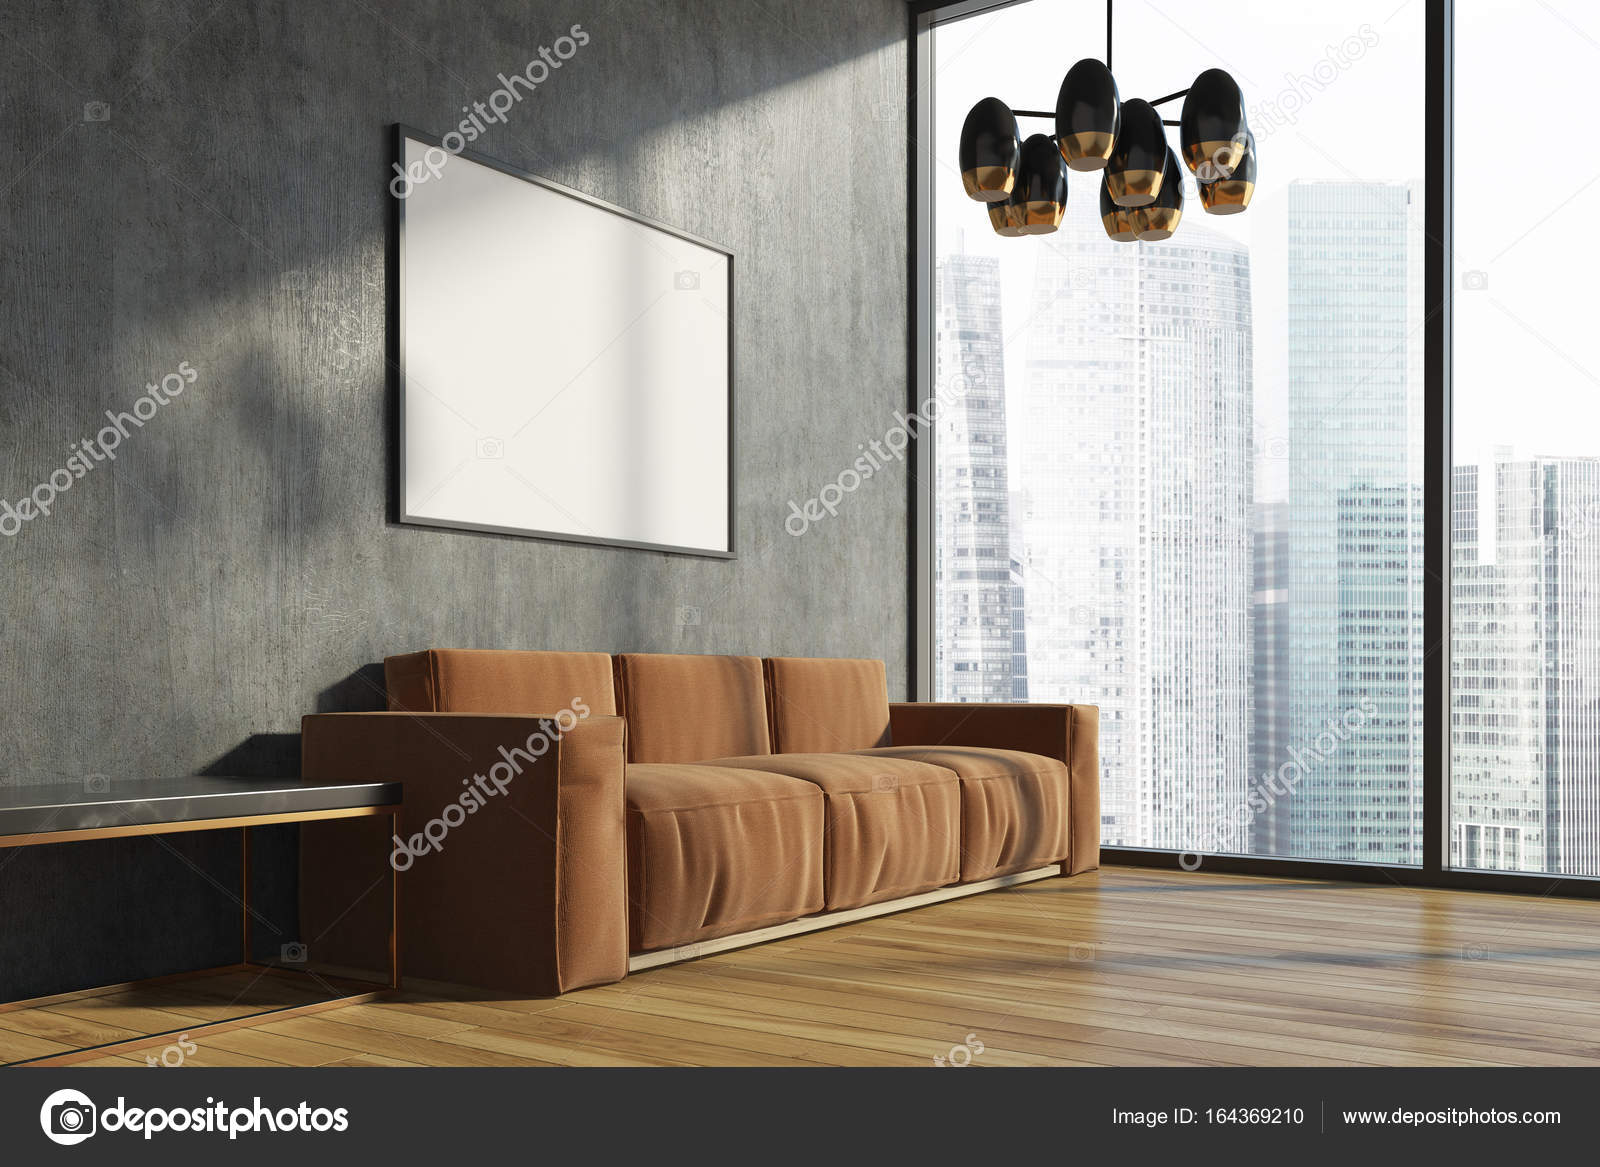 Woonkamer Met Beton : Beton bruin sofa woonkamer poster u2014 stockfoto © denisismagilov